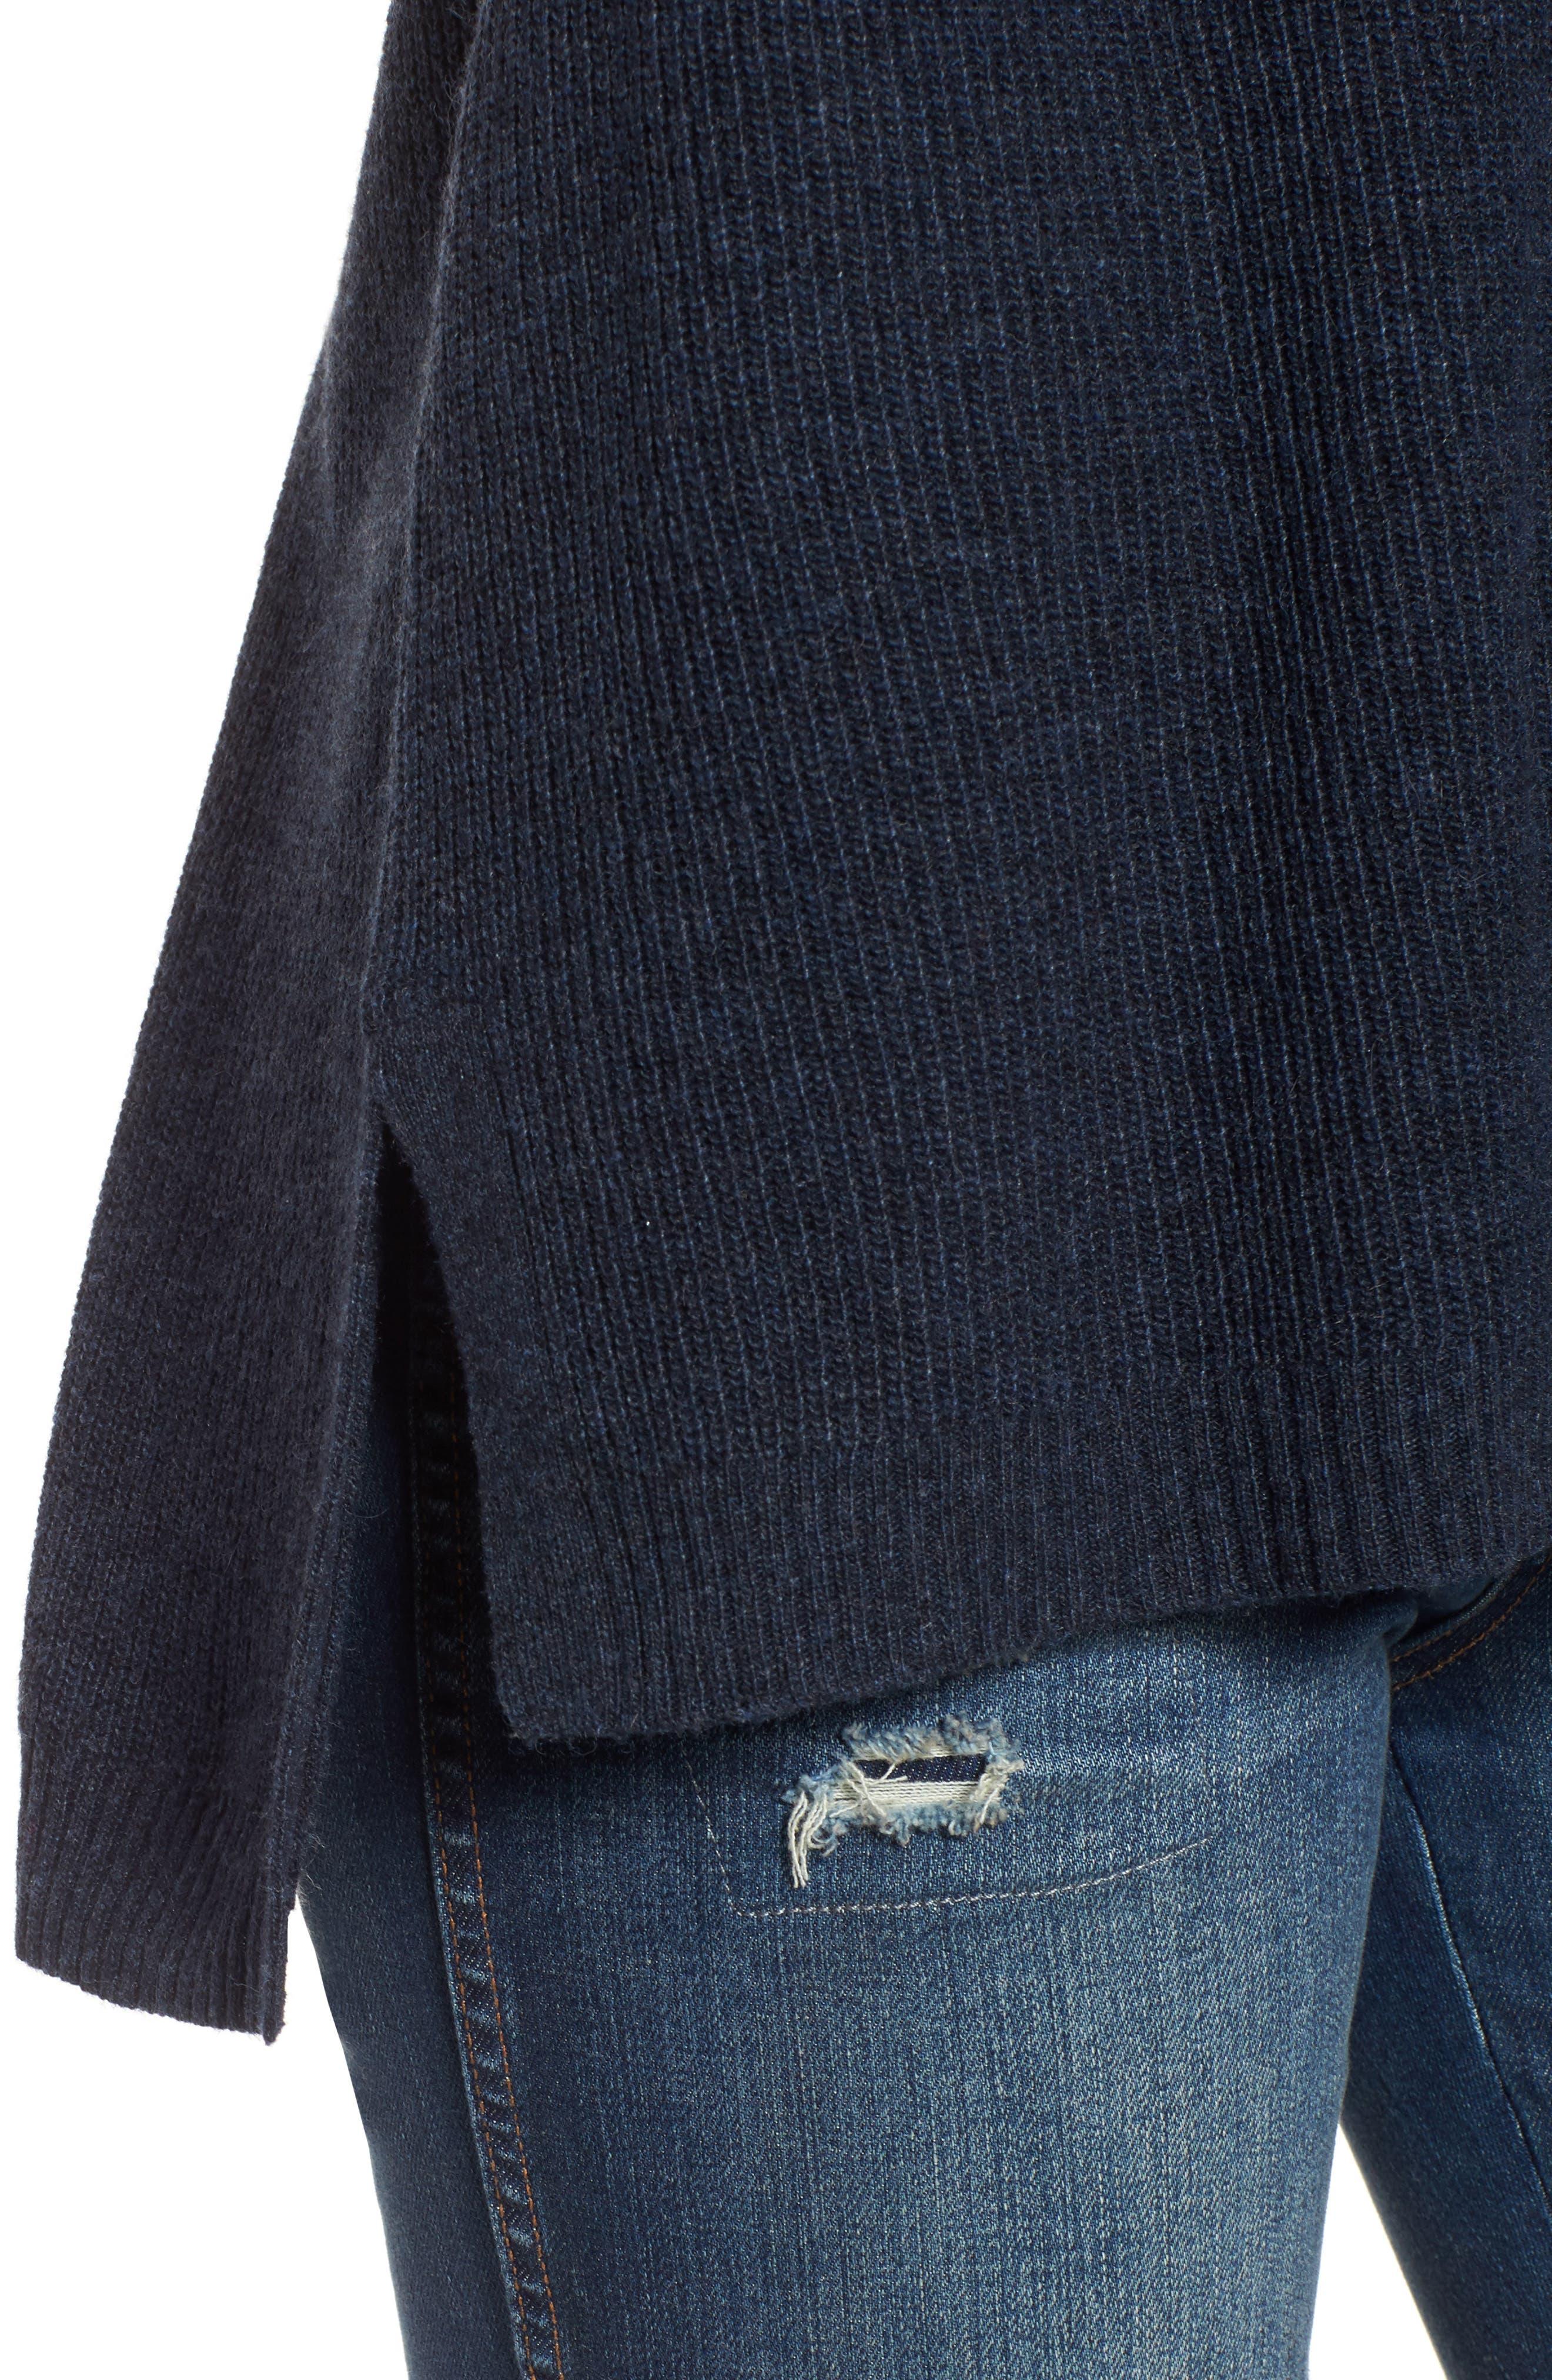 Warmlight V-Neck Sweater,                             Alternate thumbnail 4, color,                             400